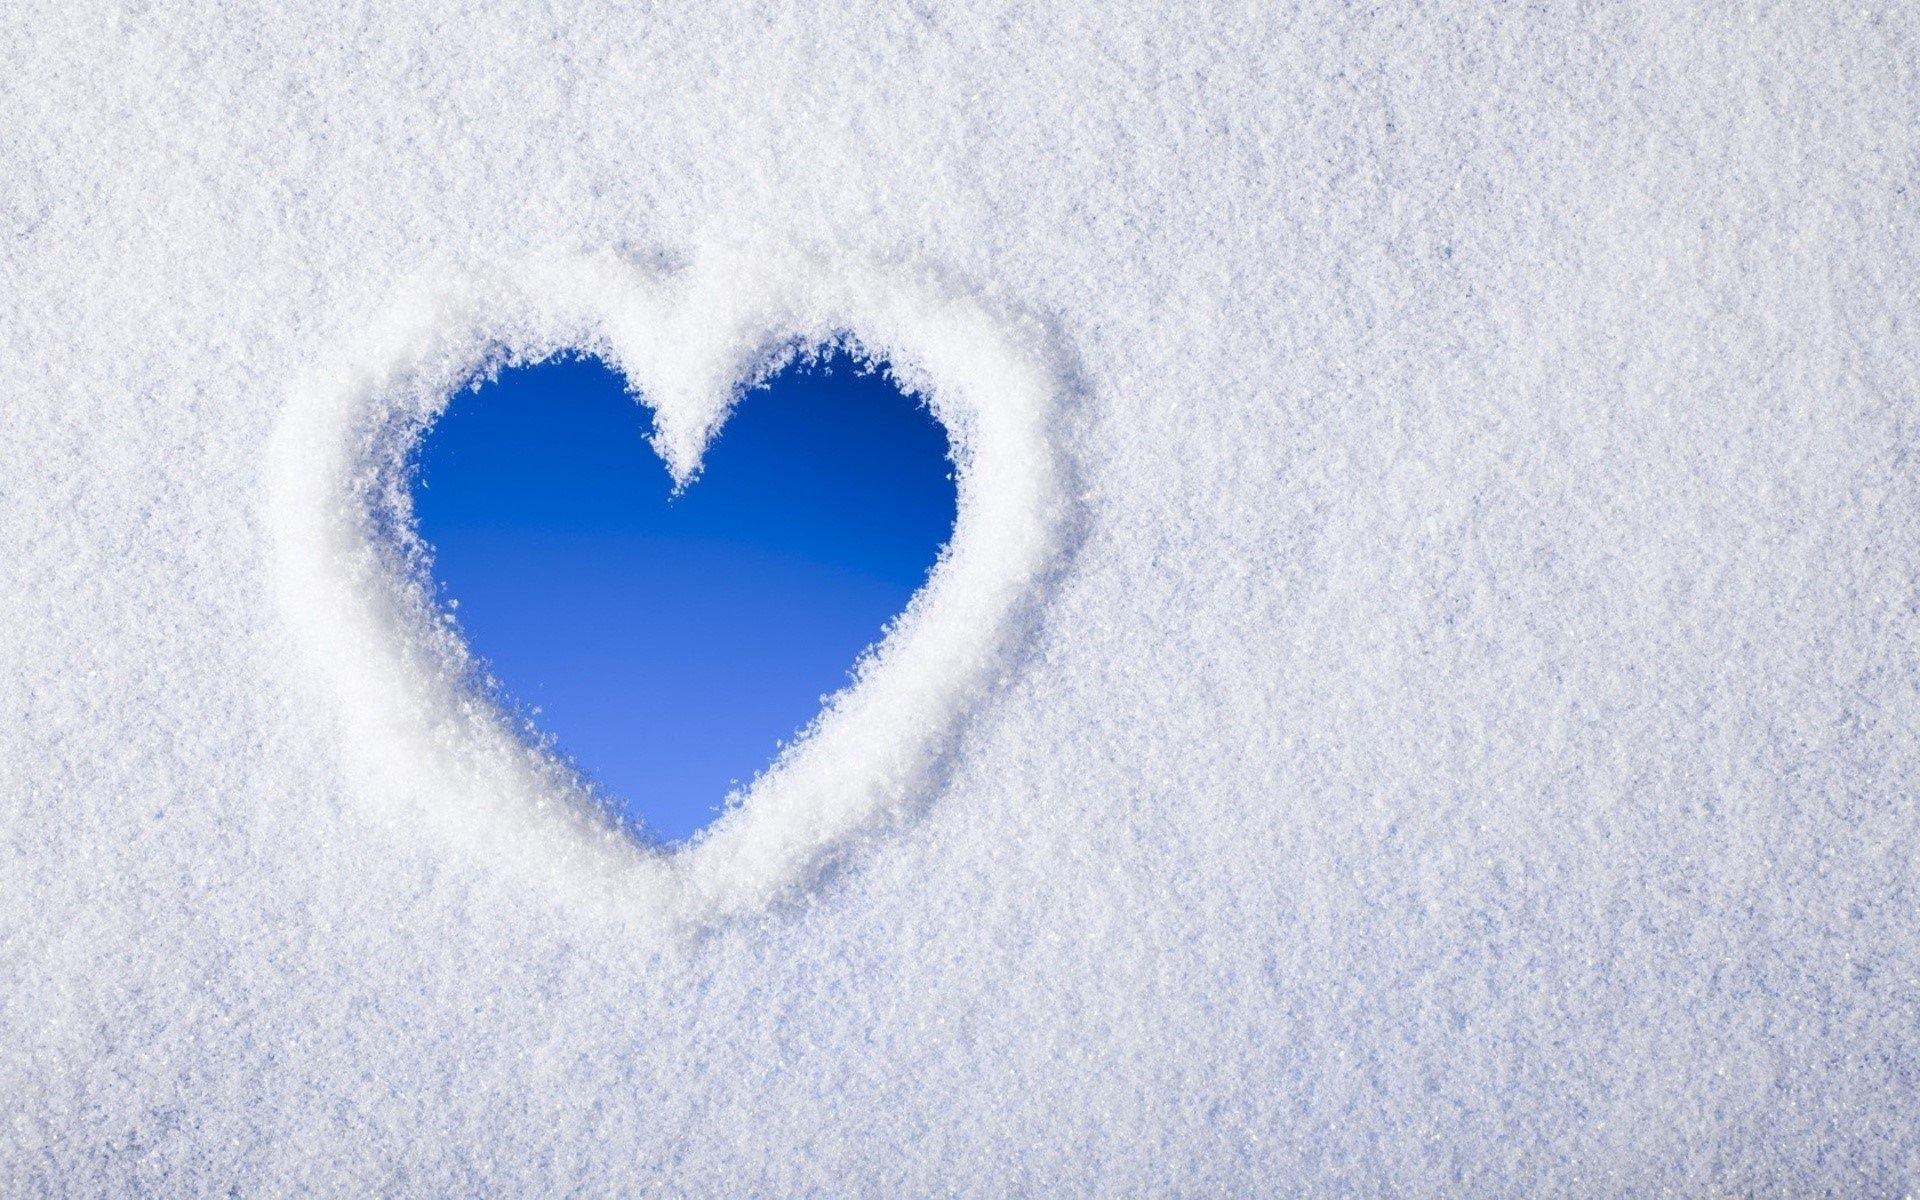 Wallpaper Heart of snow